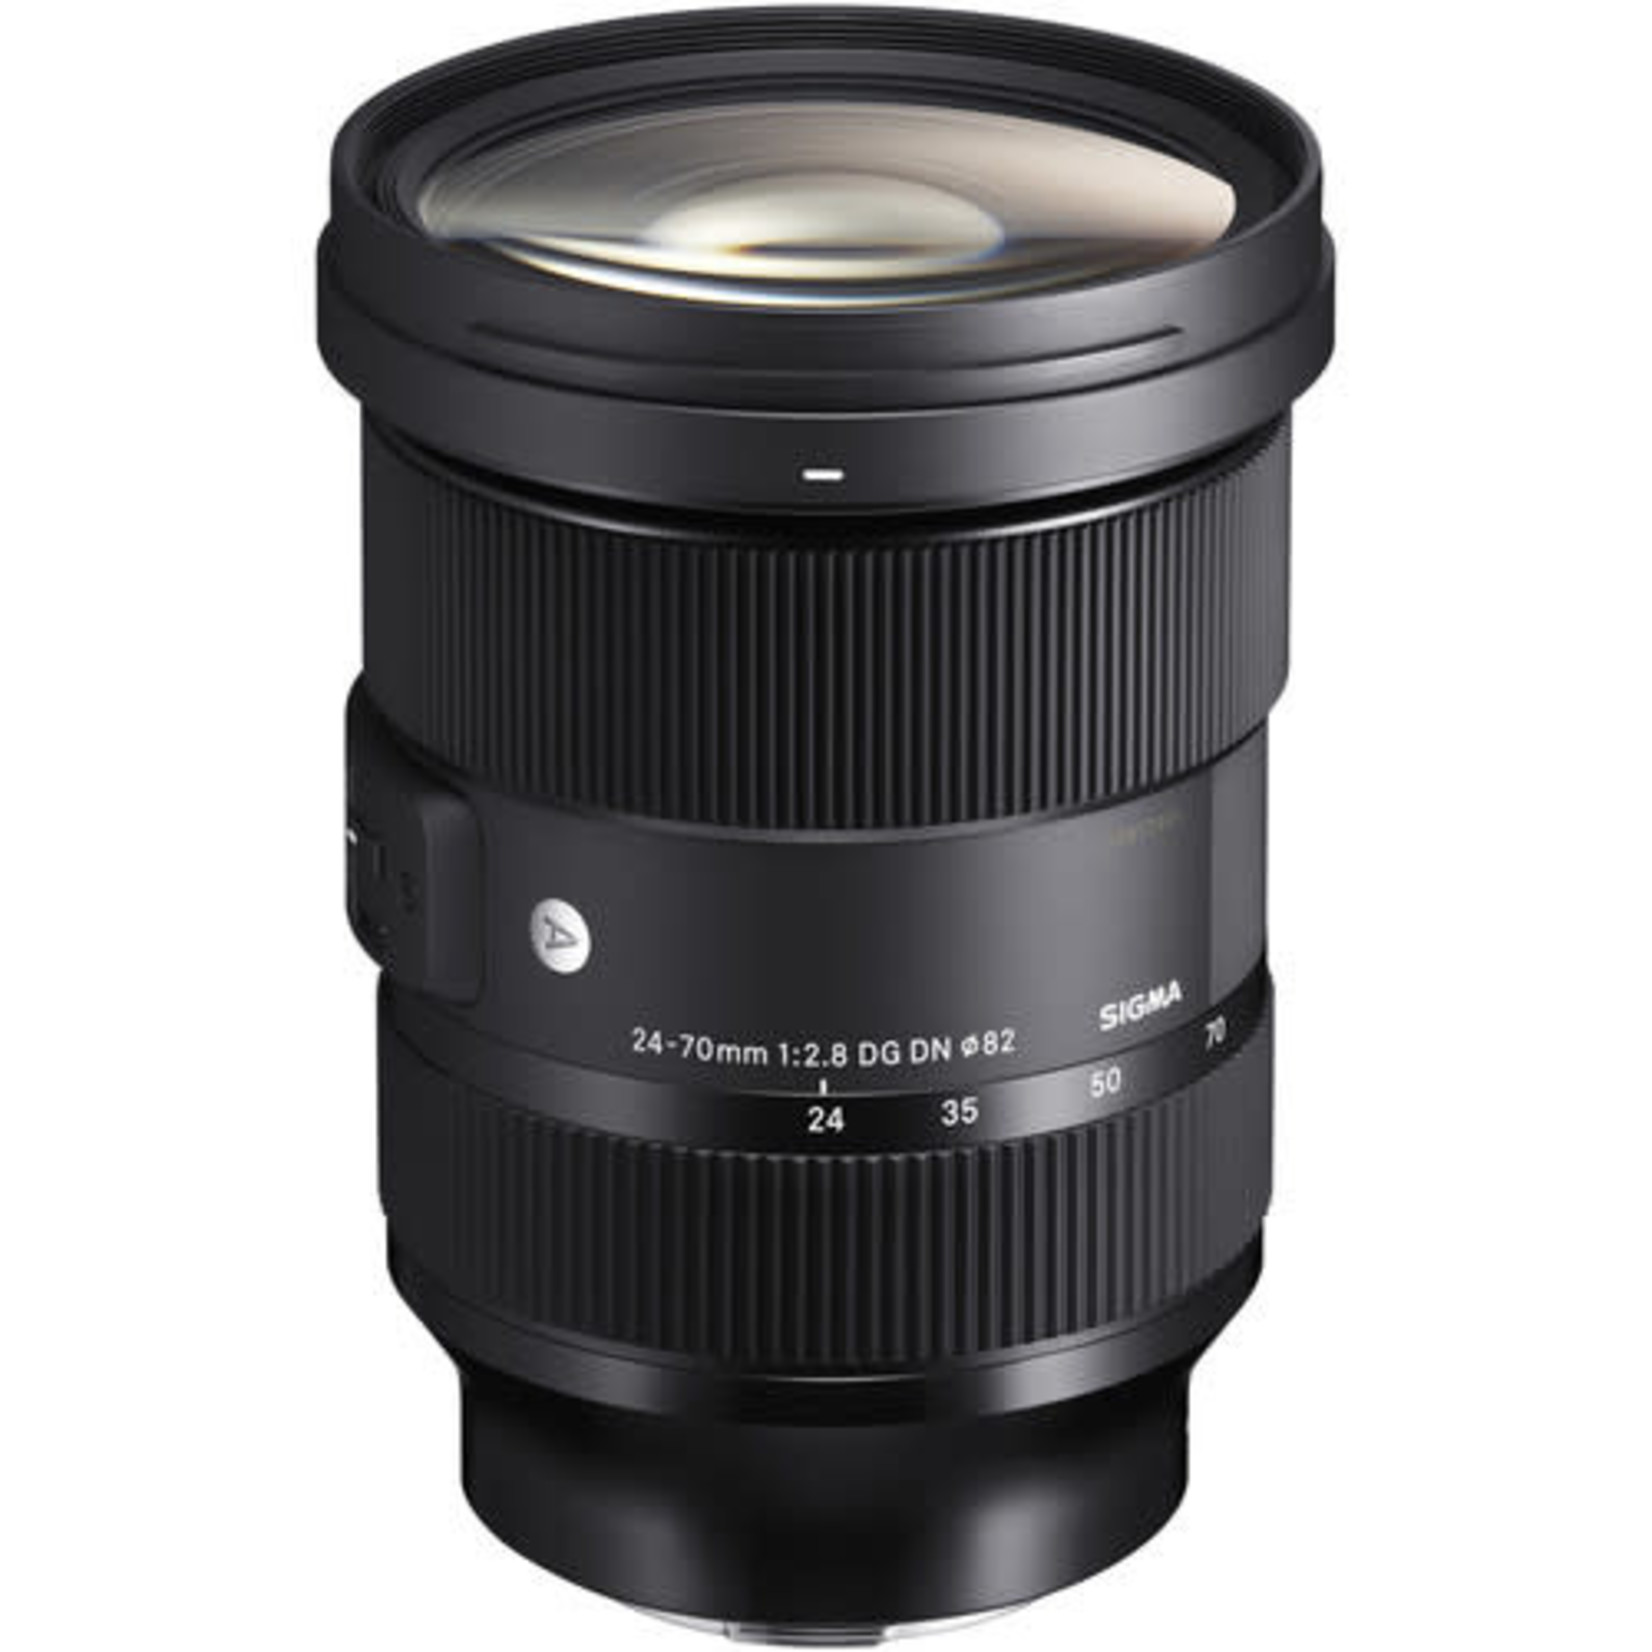 Sigma Sigma 24-70mm f/2.8 DG DN Art Lens for Sony E